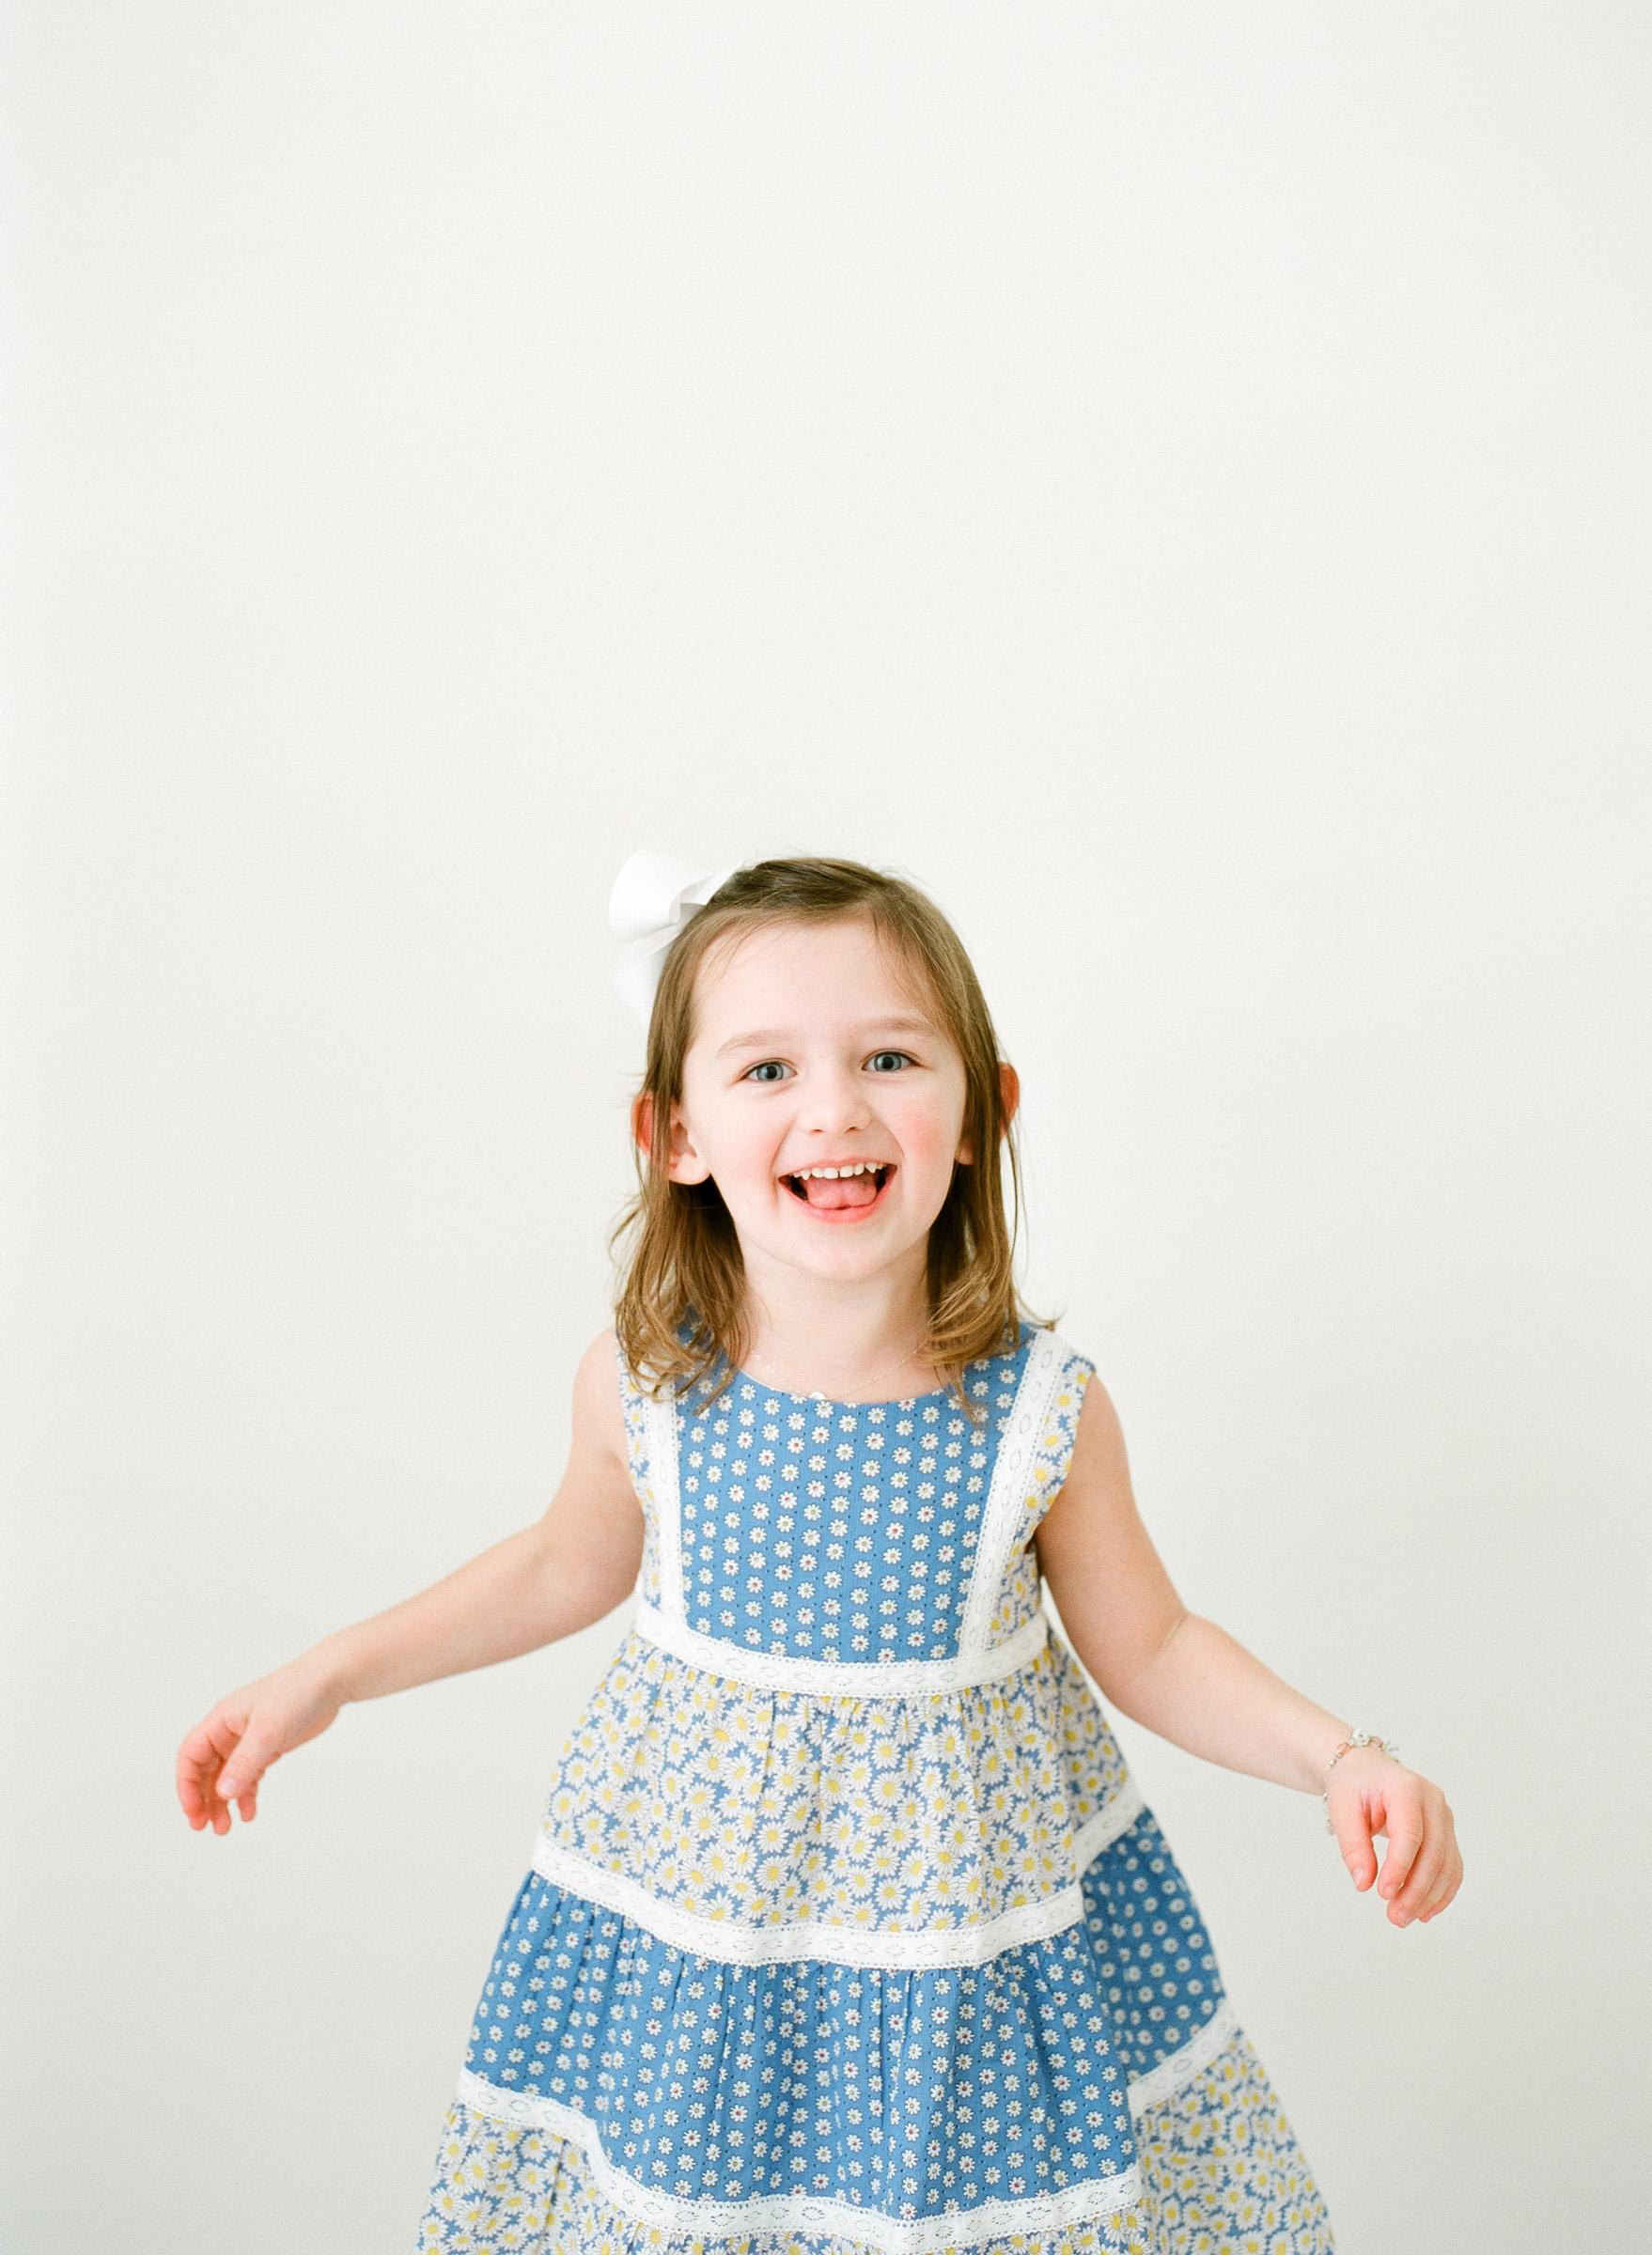 raleigh-wake-forest-studio-family-film-photographer-baby-milestone-photos